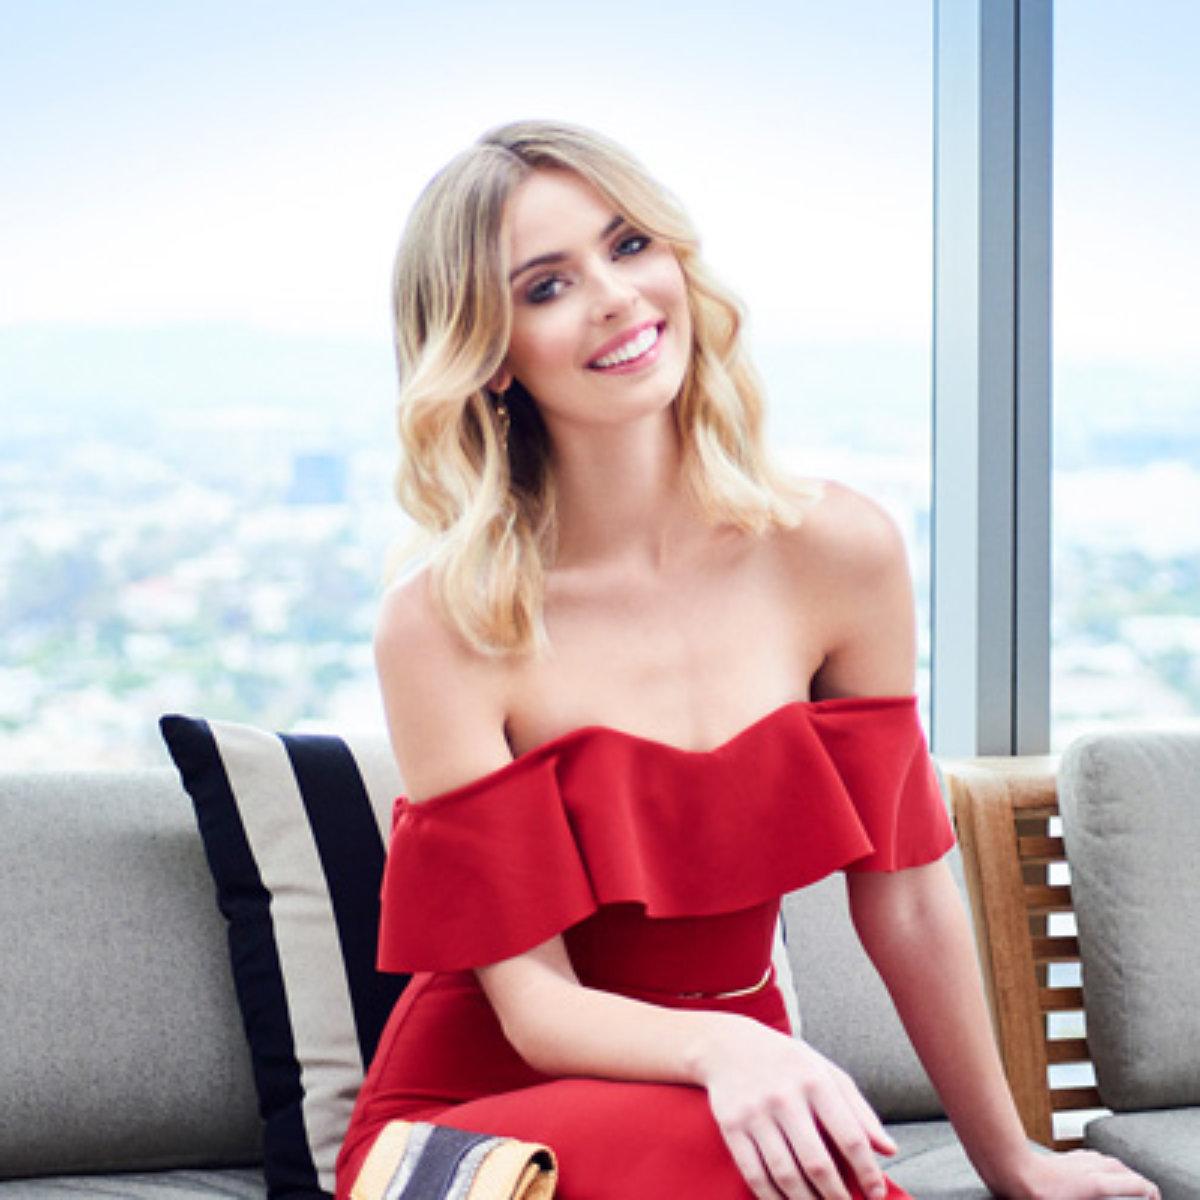 Beautiful blonde smiling wearing a red dress